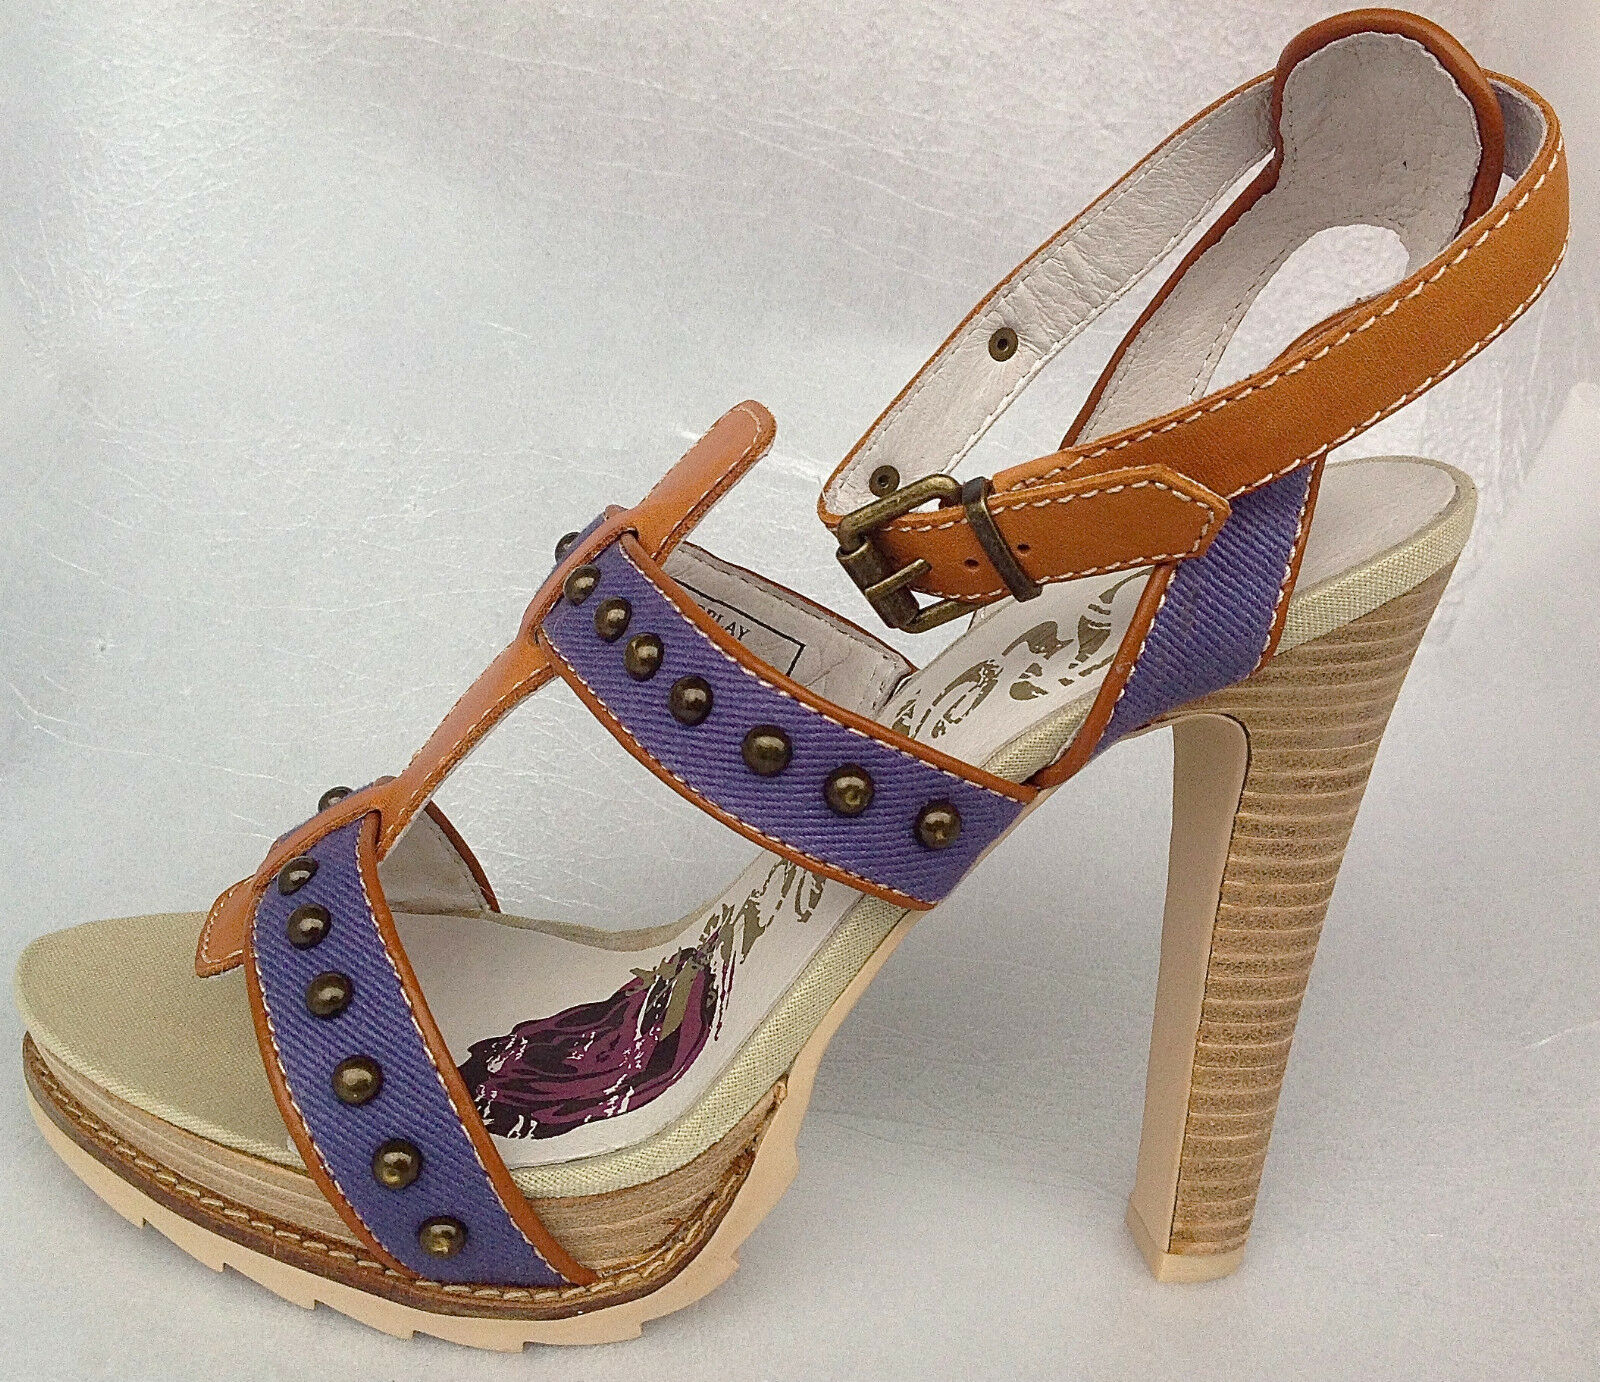 Replay ADELINE RP420002T Damen Sandale Sandaleetten Sandales EU 39, 40, UK 4 - 7